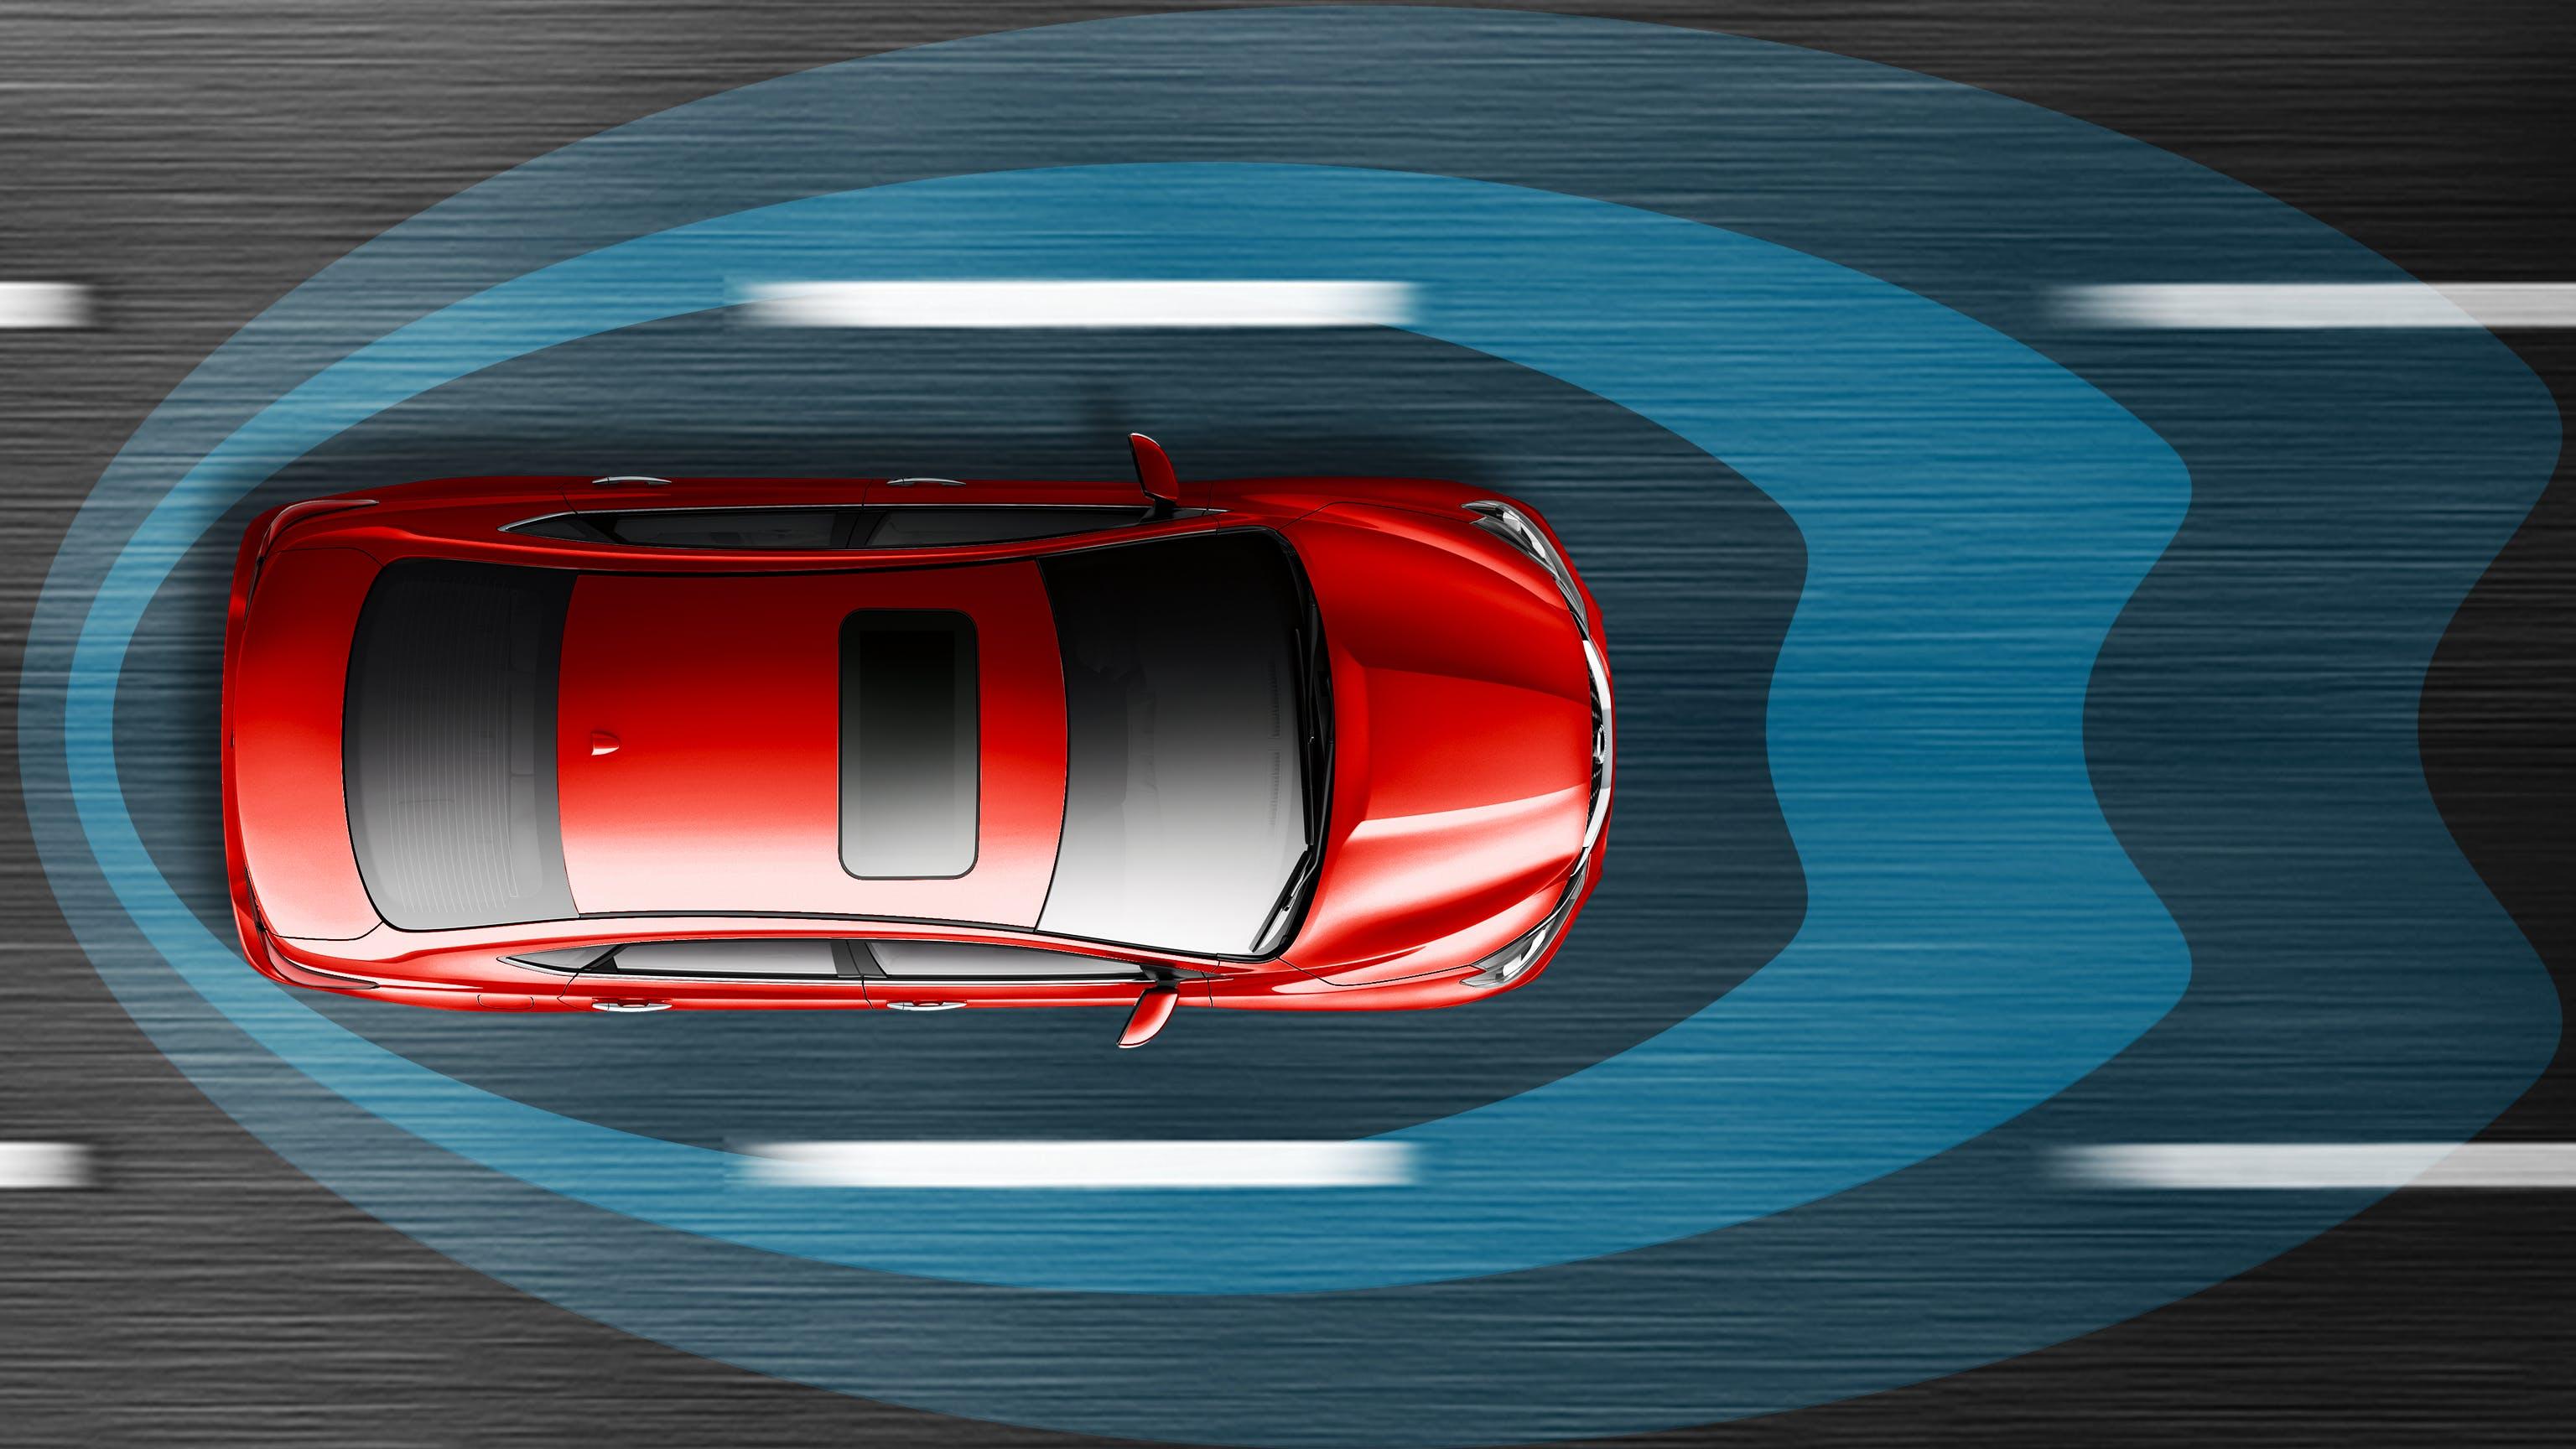 Nissan Safety Shield